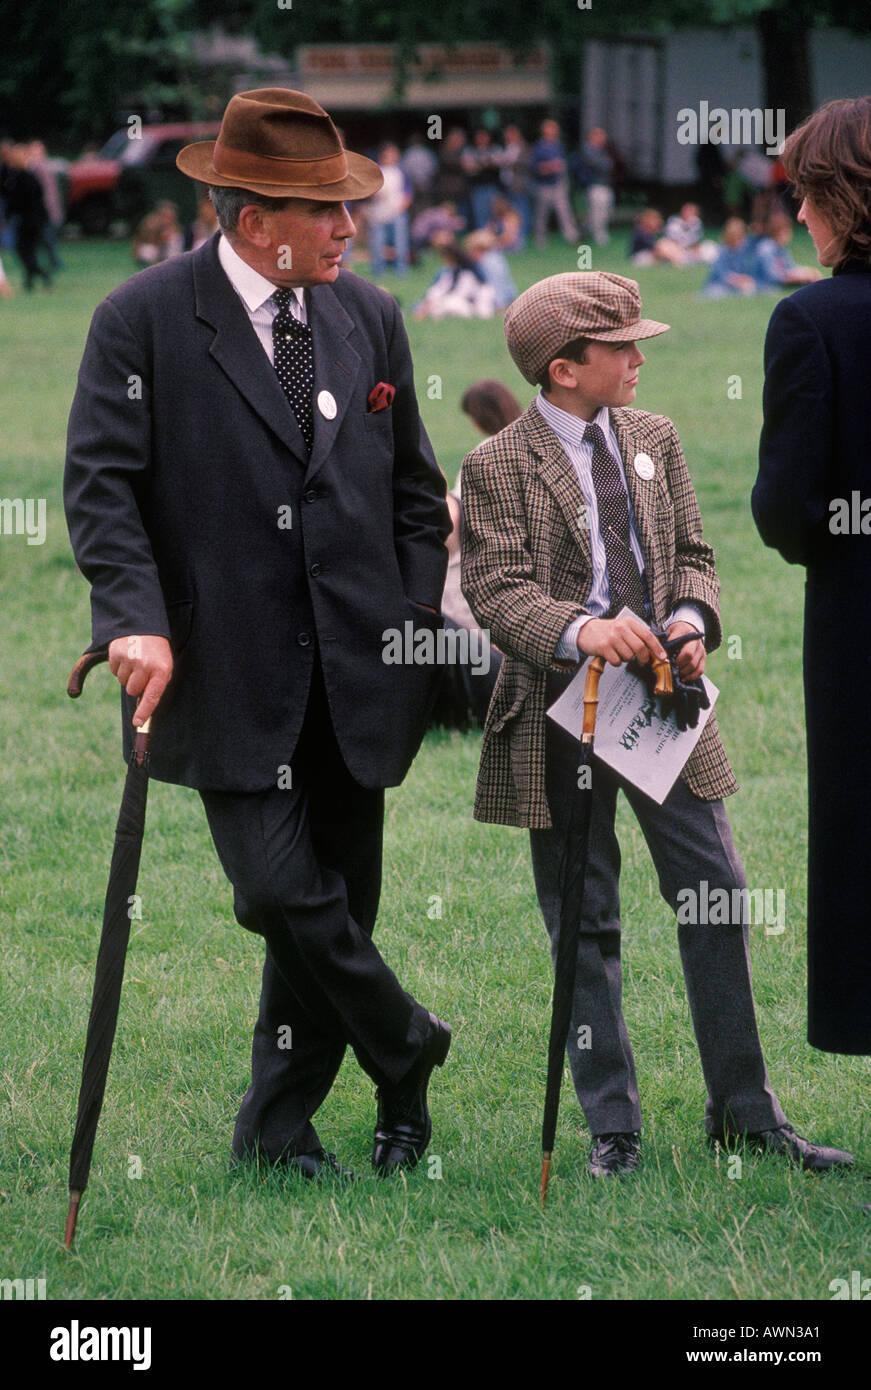 Like father like son 'Countryside Alliance' Demonstration 'Hyde Park' London England HOMER SYKES - Stock Image